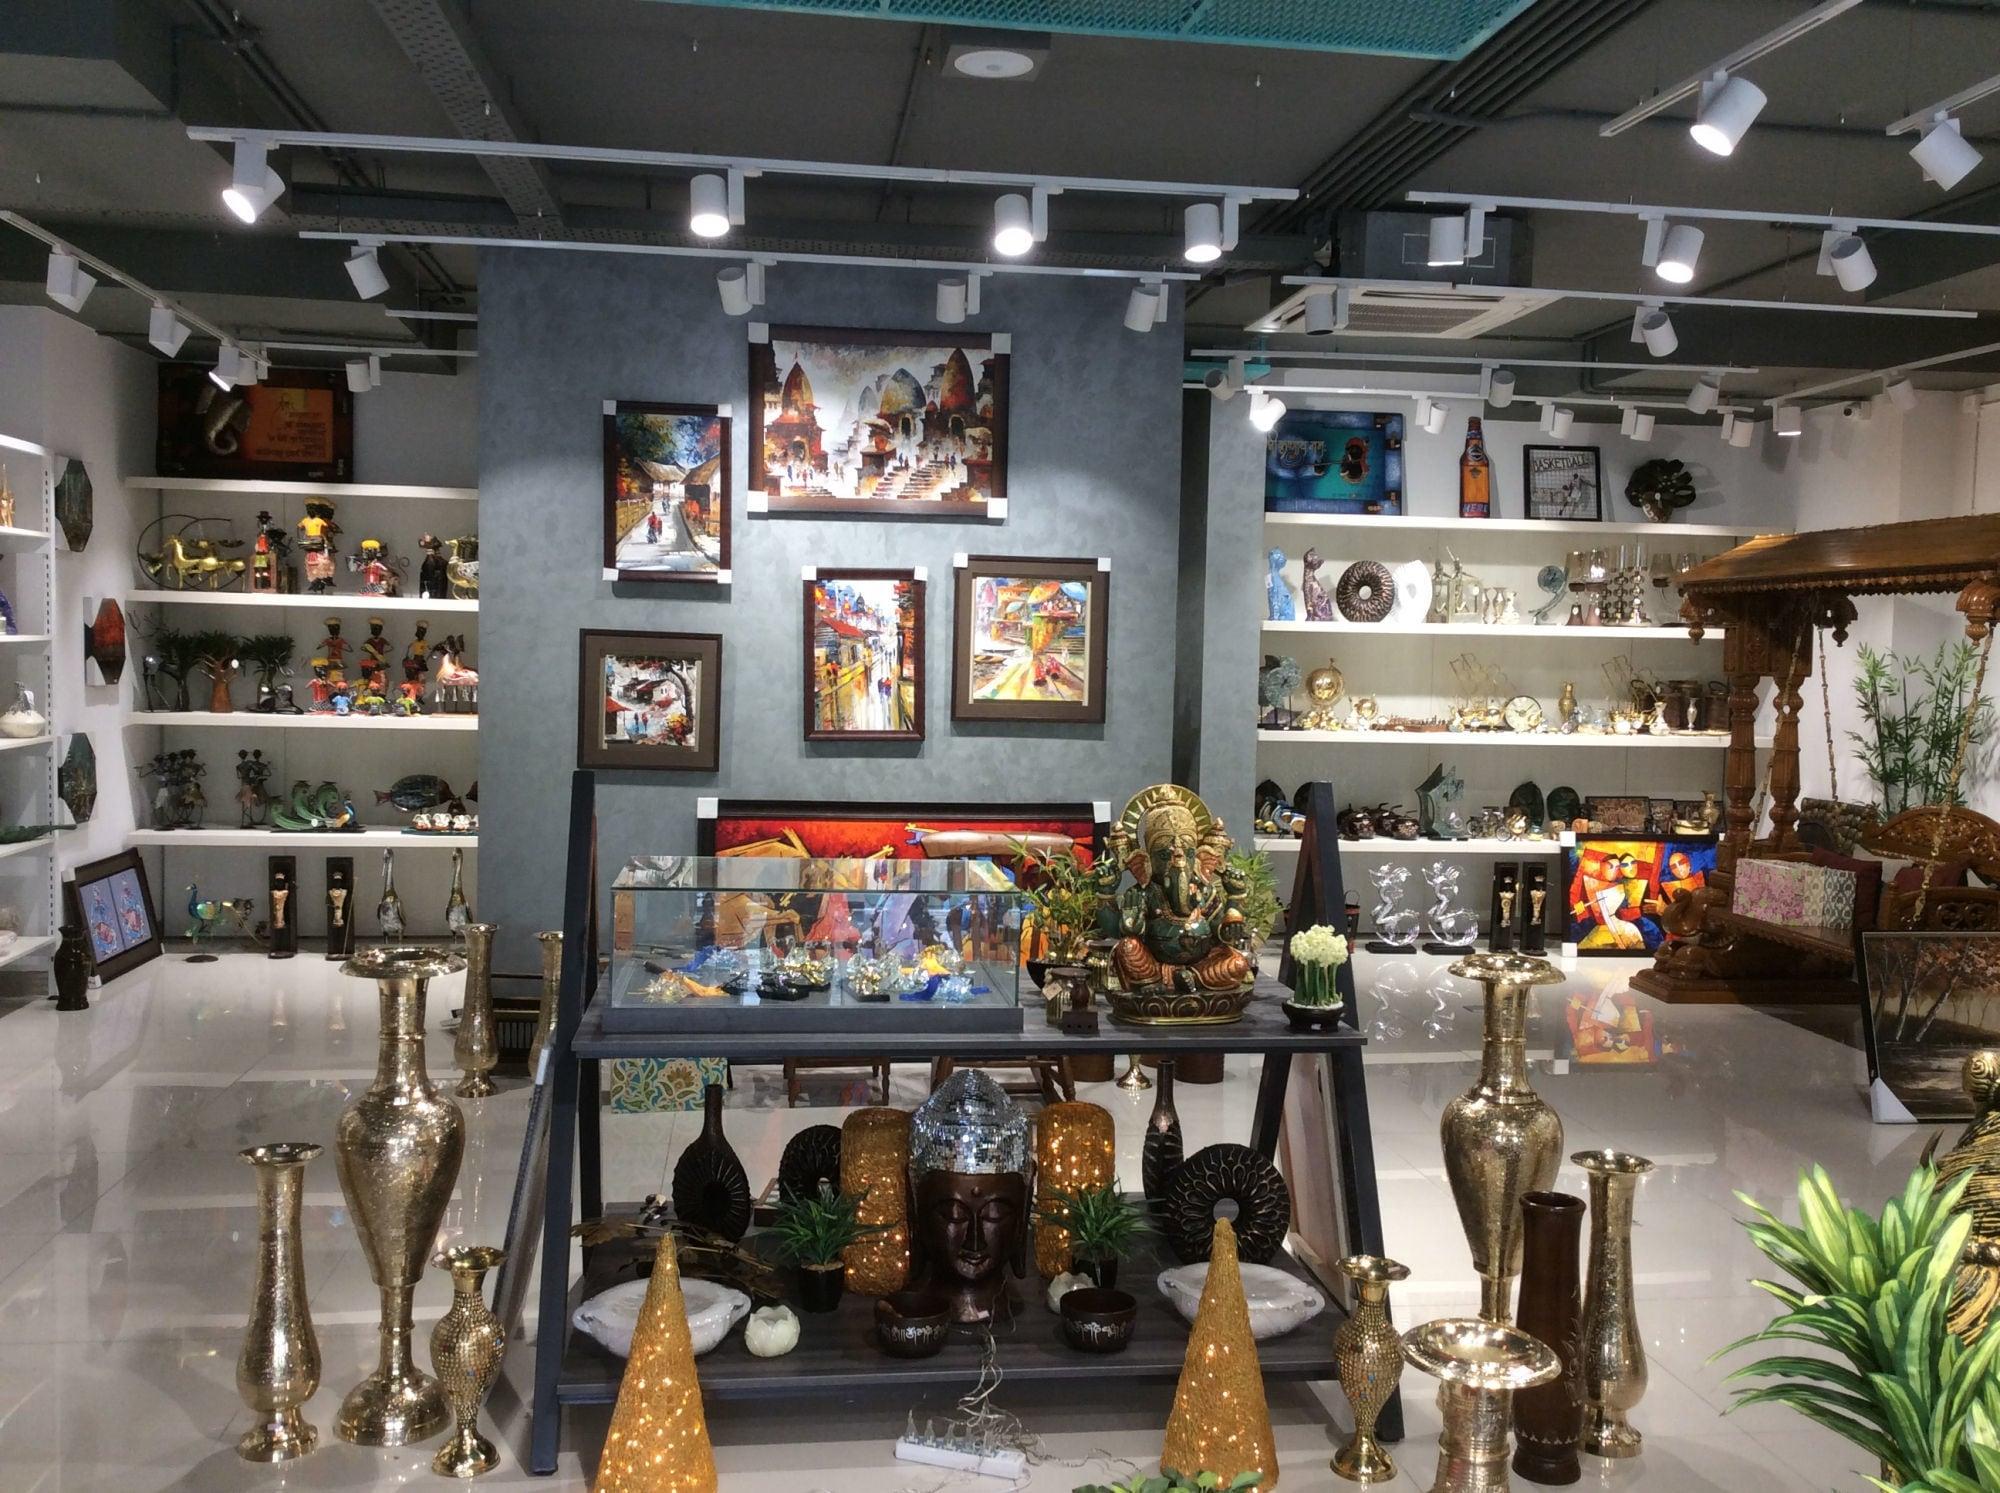 Good ... TESOR Home Decor U0026 More Photos, HSR Layout Sector 1, Bangalore   Gift  Shops ...